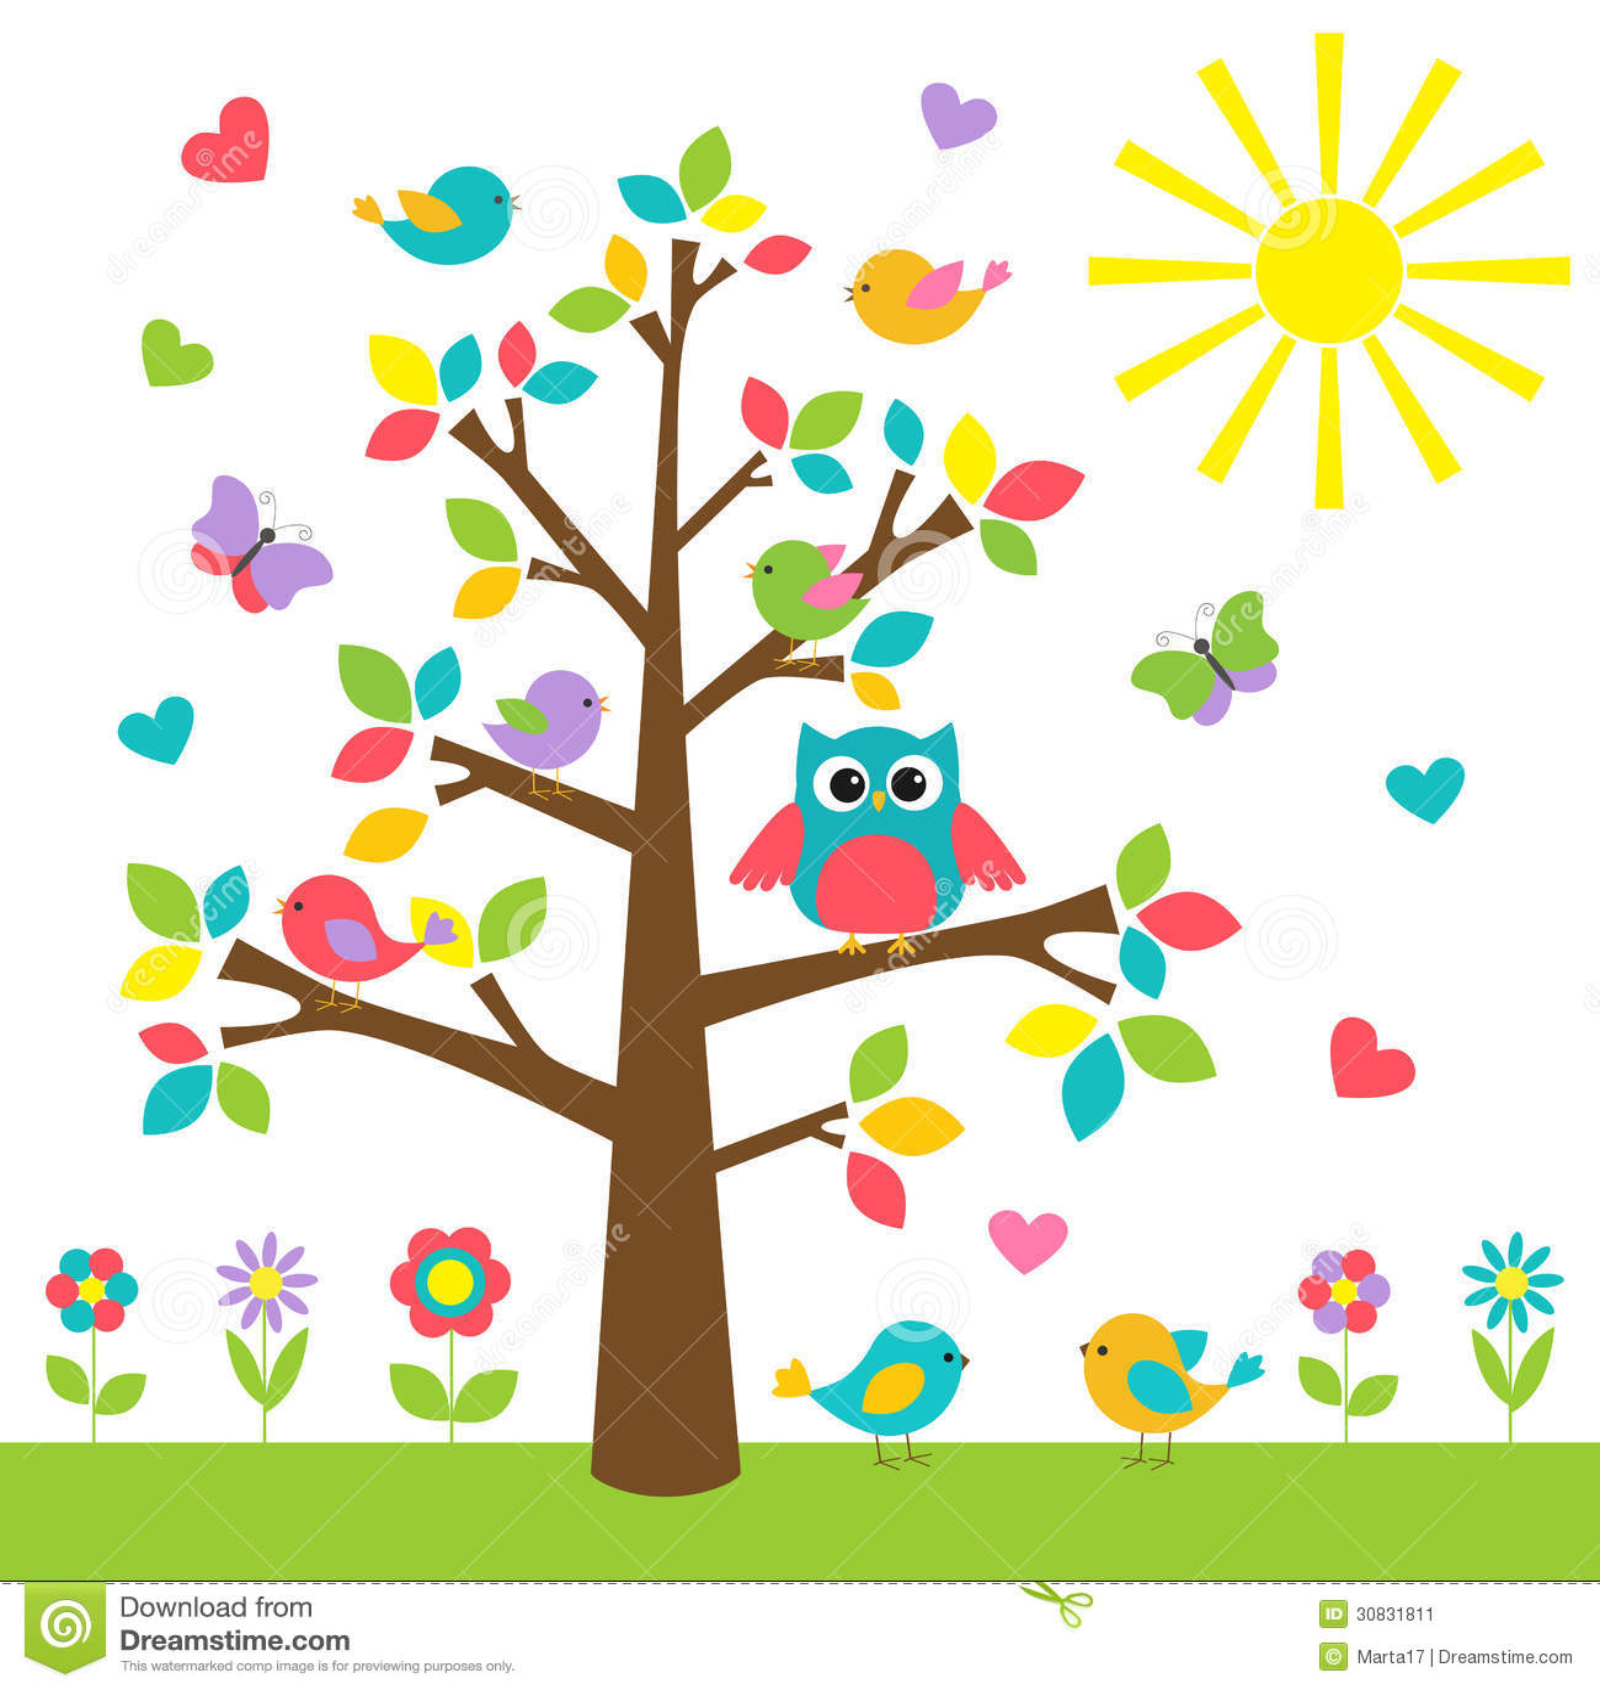 Colorful Tree Stock Image - Image: 30831811